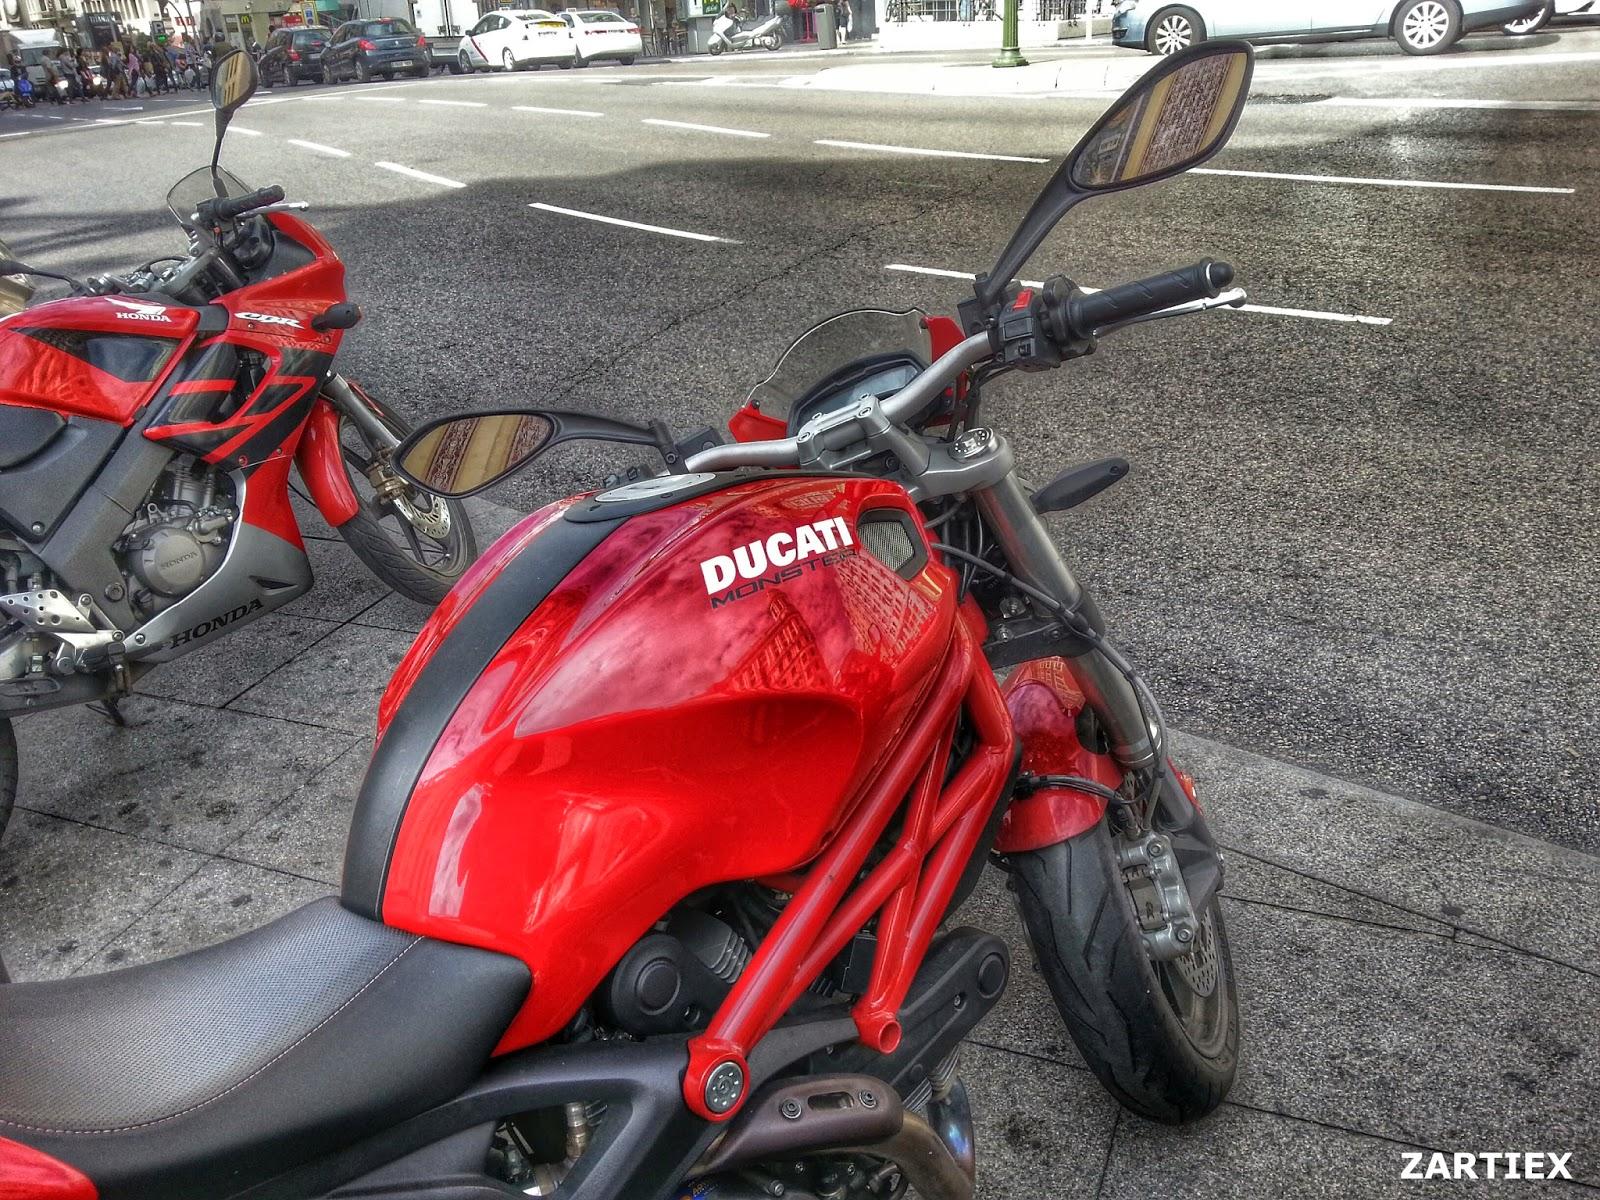 Motorcycle Insurance - Auto Insurance